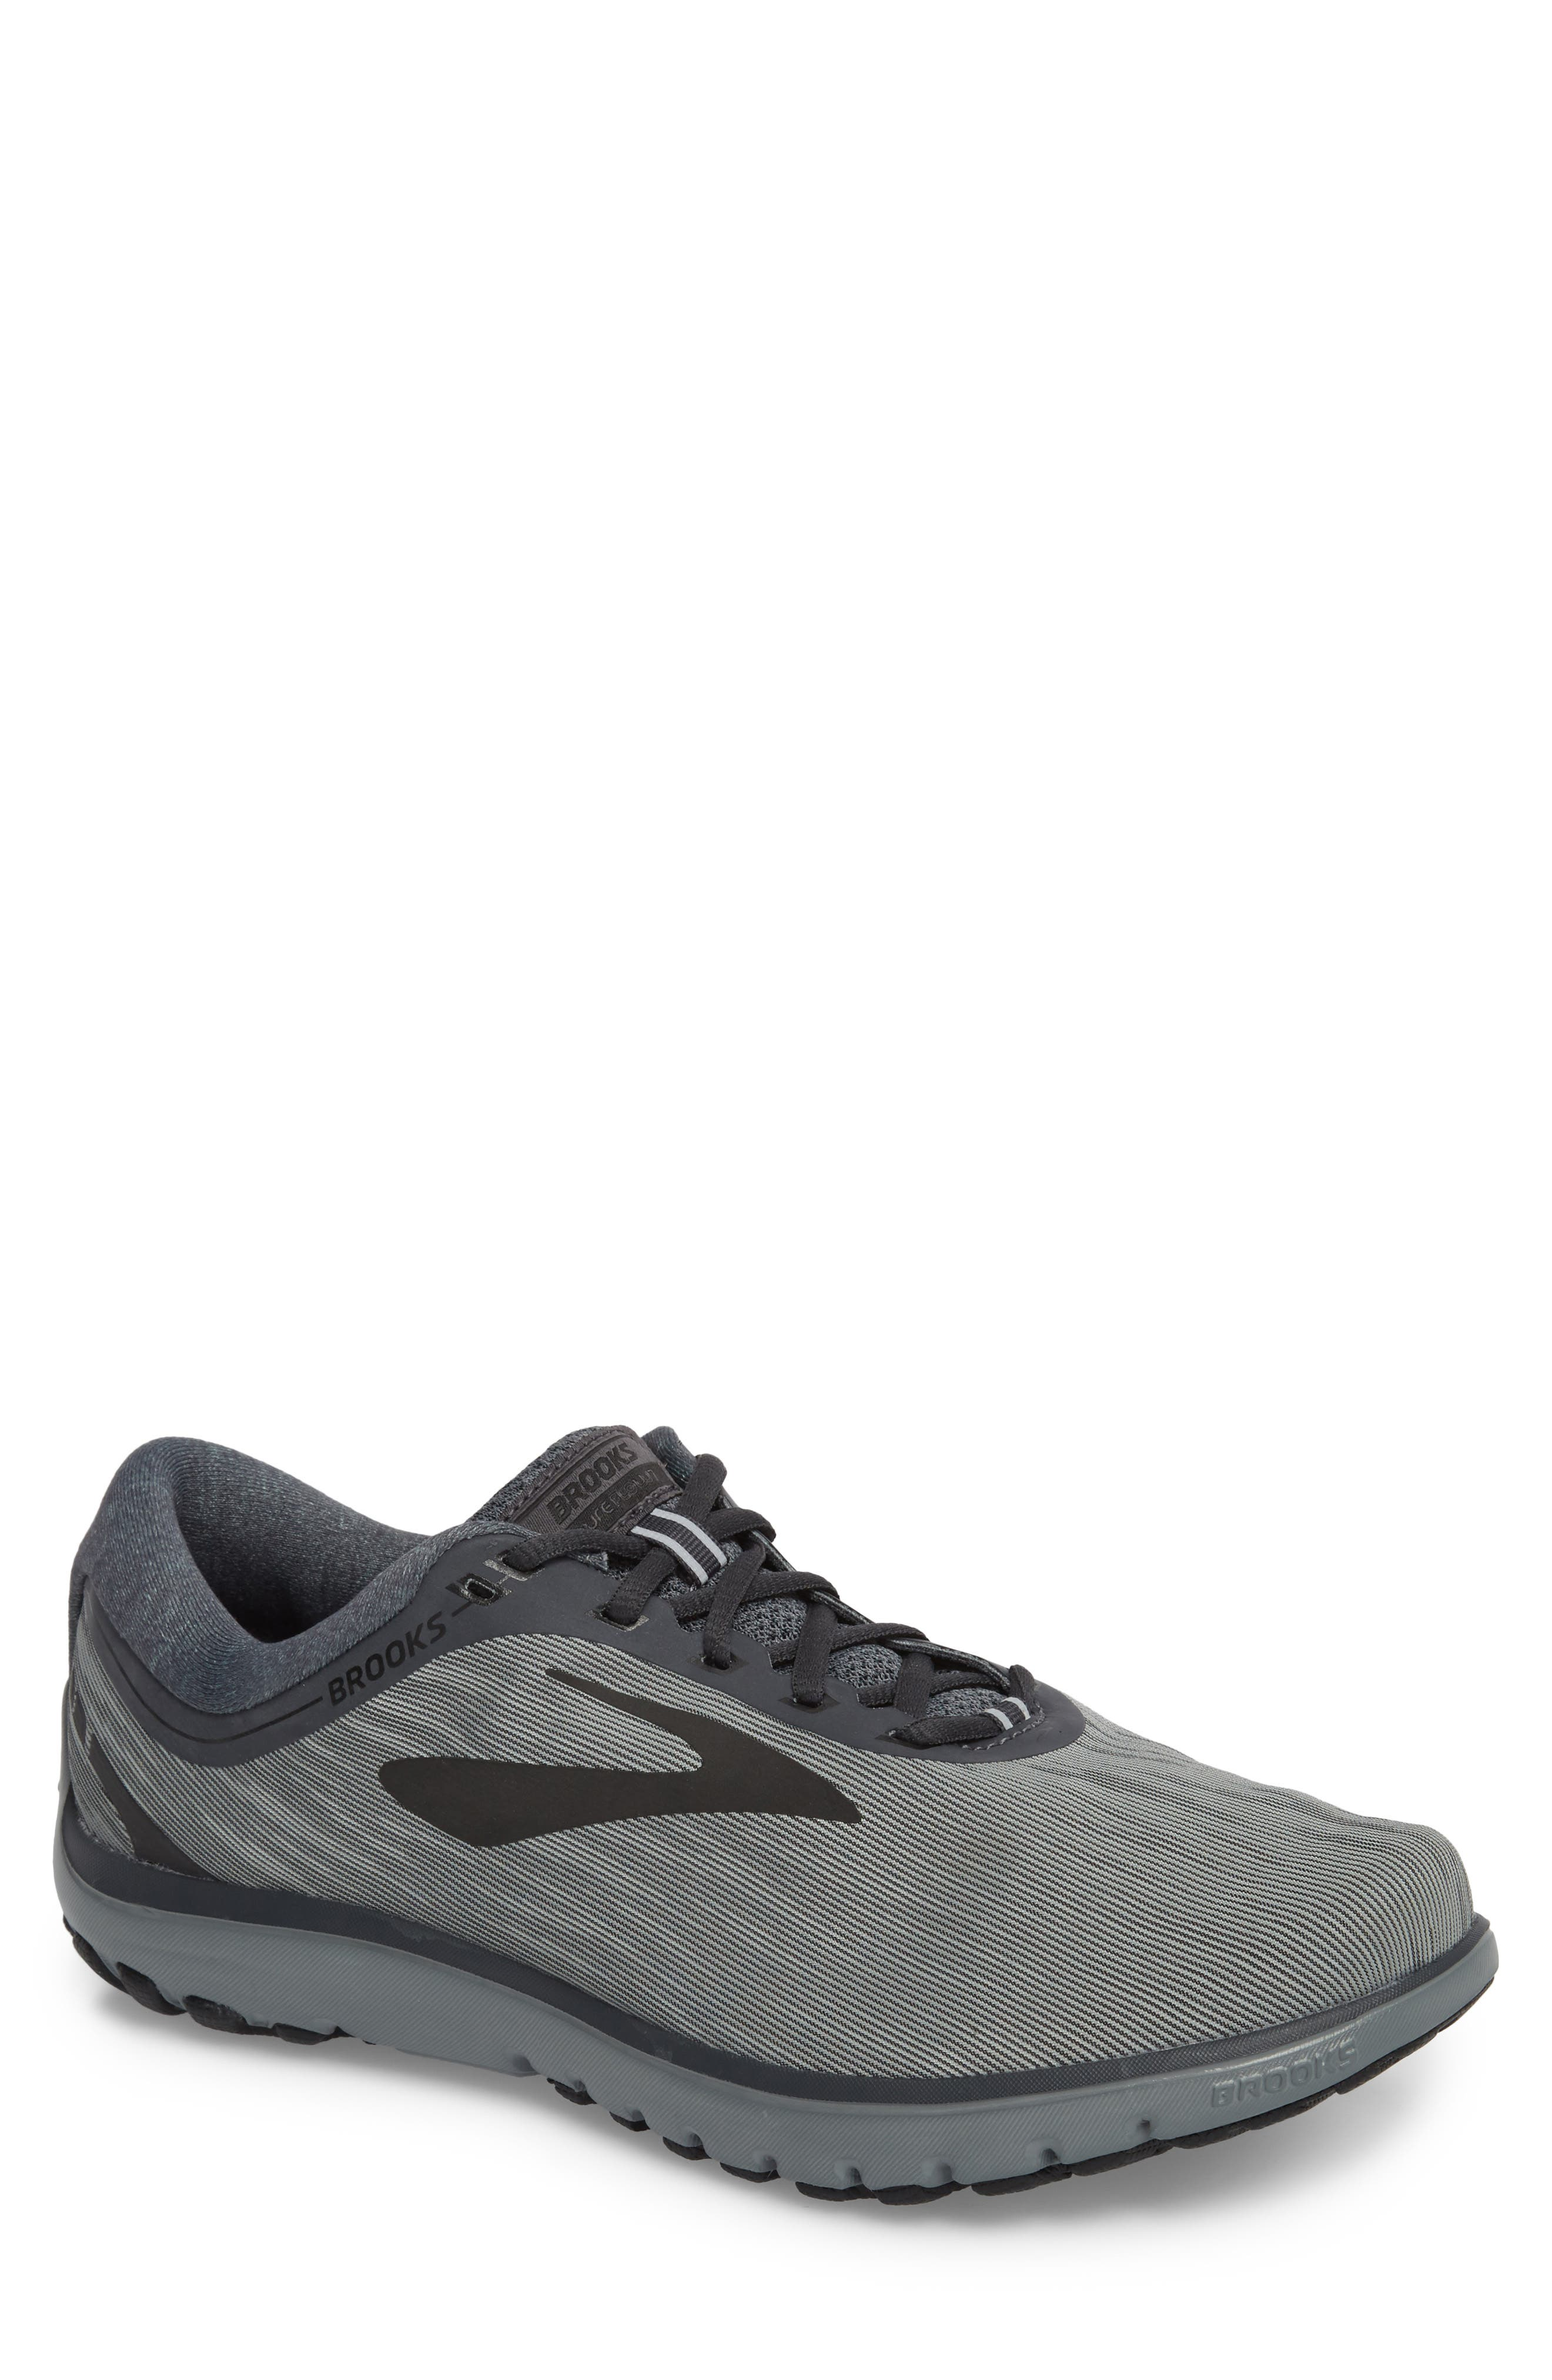 25f2b22b1603e Brooks for Men  Running   Walking Shoes